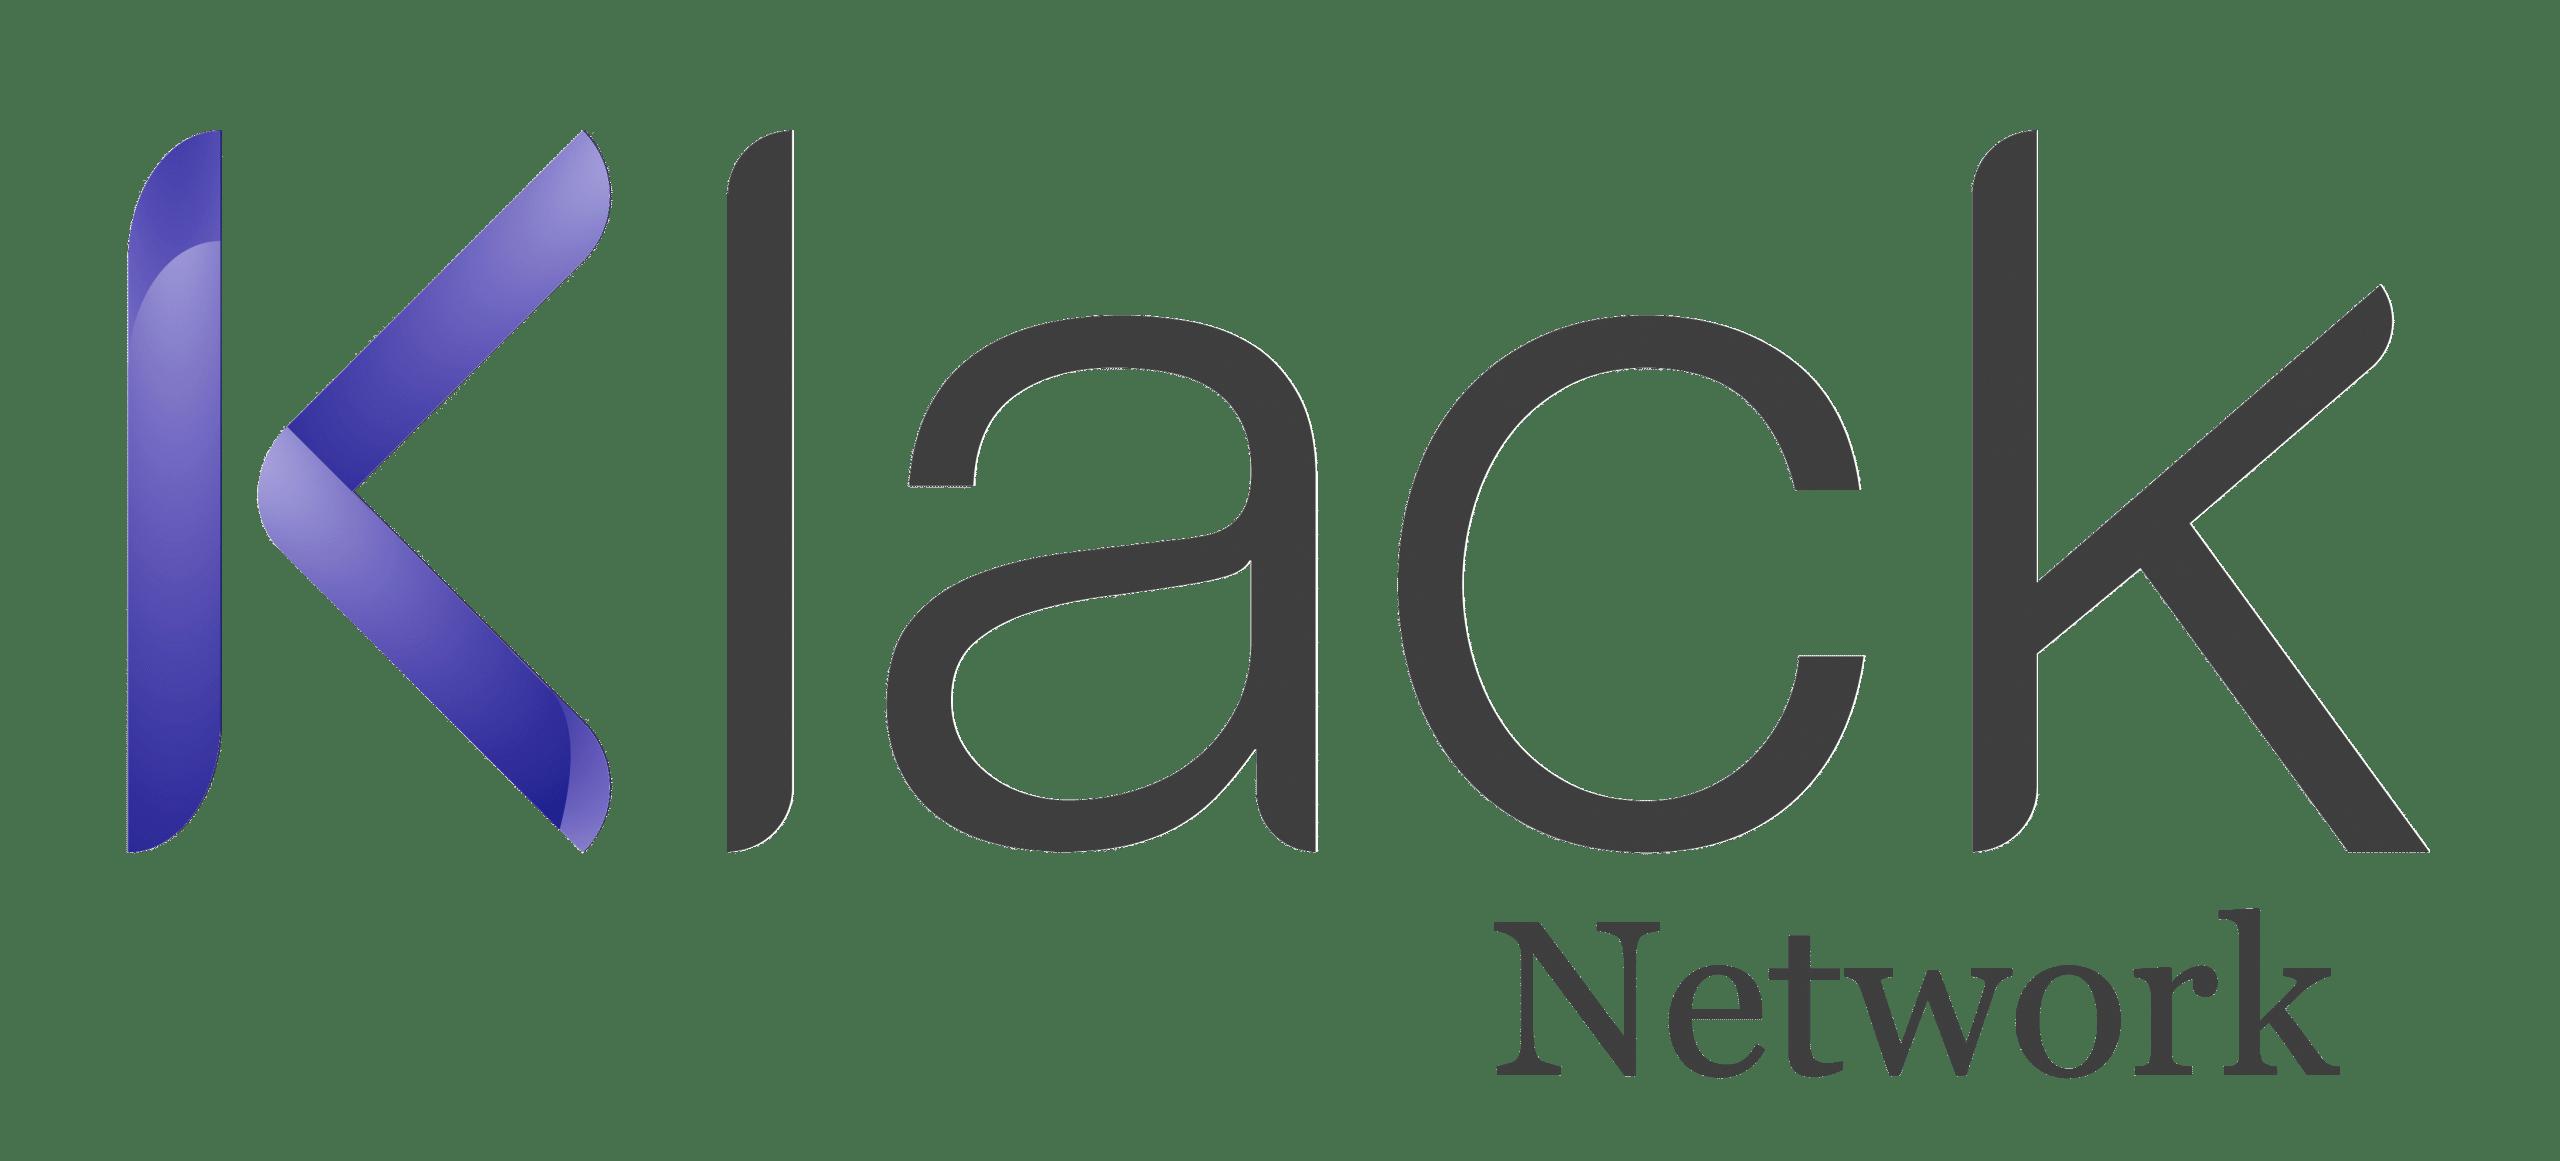 Klack Network Logo